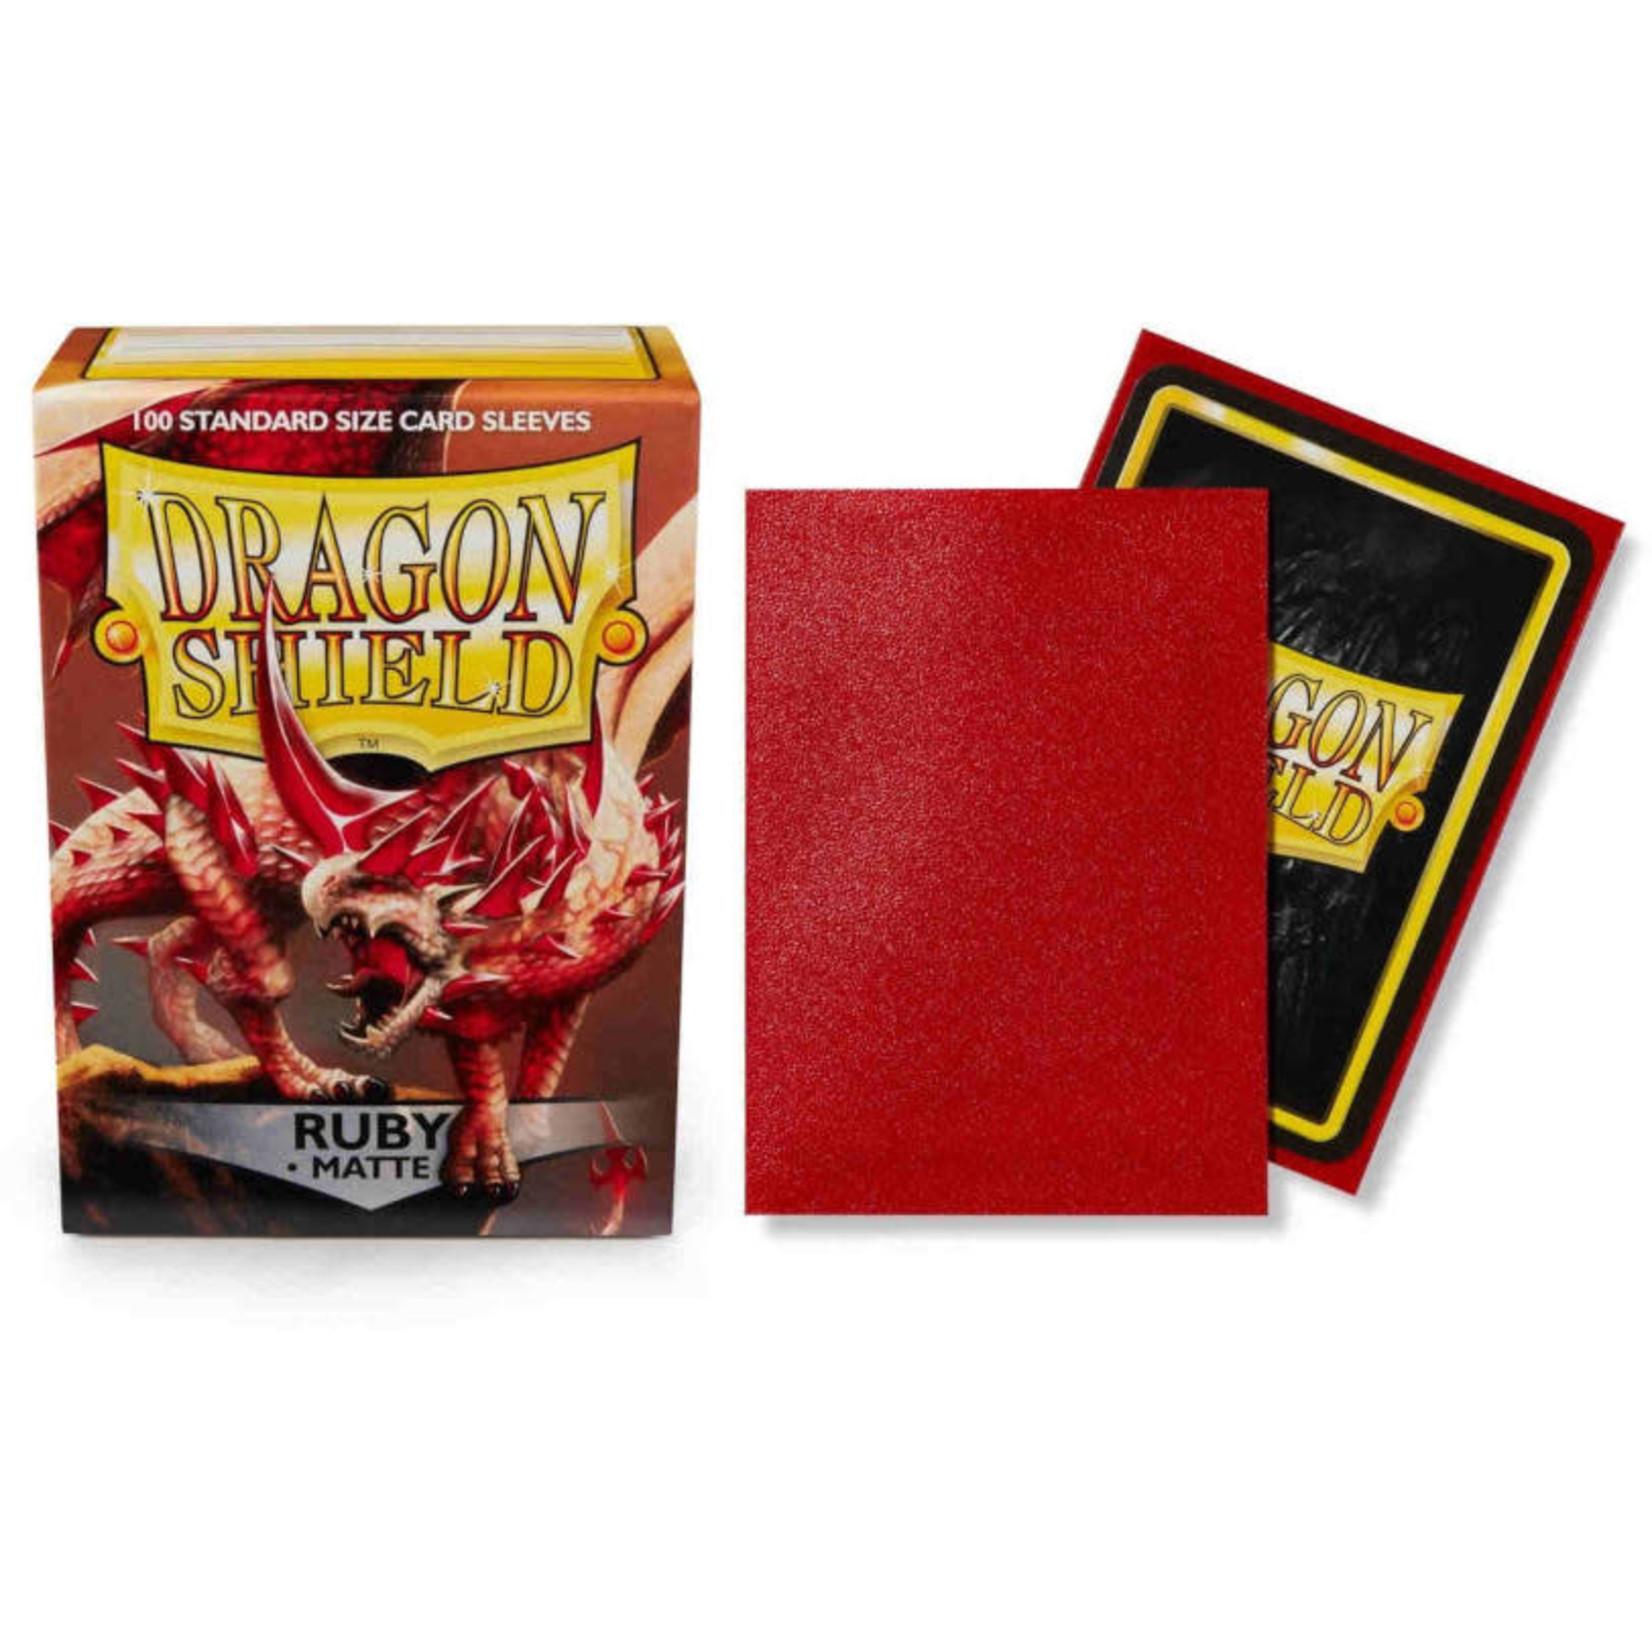 Dragon Shield Matte Ruby (100 count) Standard